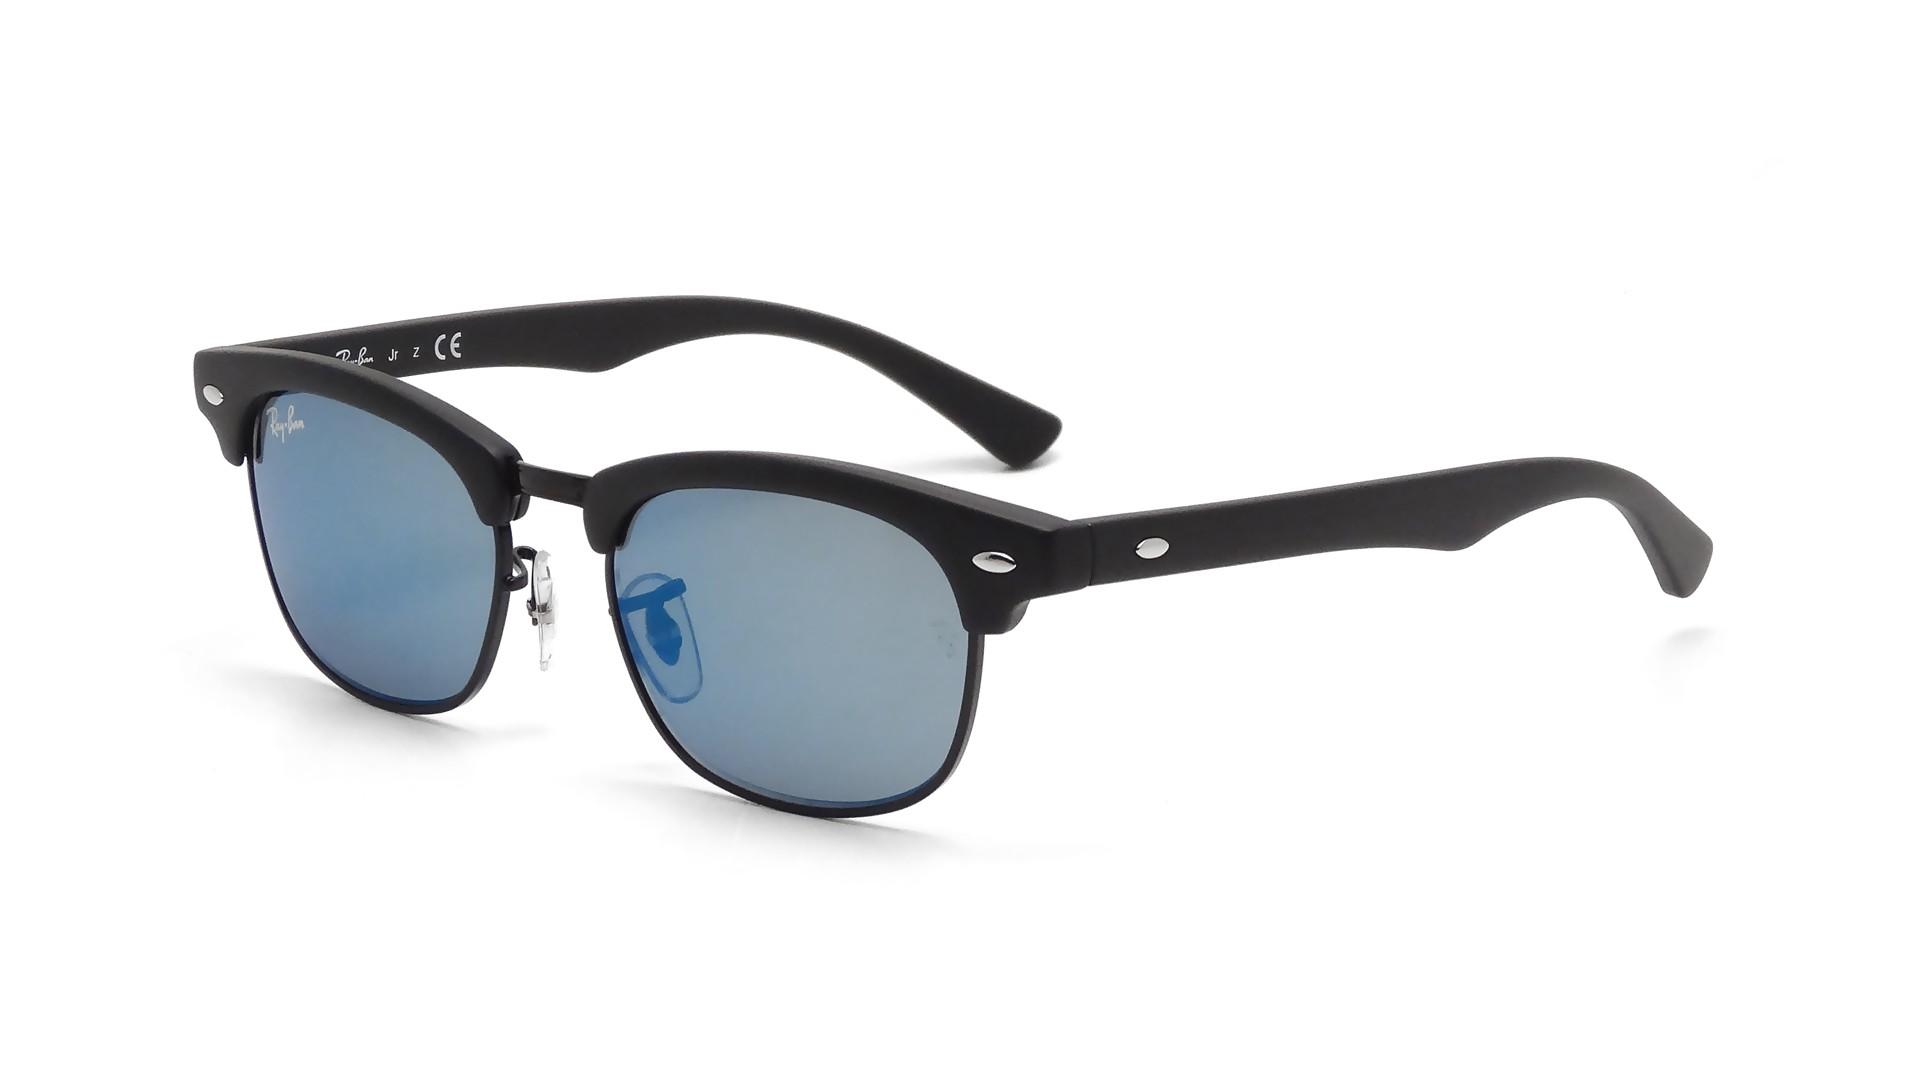 0c996be8bfe Sunglasses Ray-Ban Clubmaster Black Matte RJ9050S 100S 55 45-16 Junior  Mirror